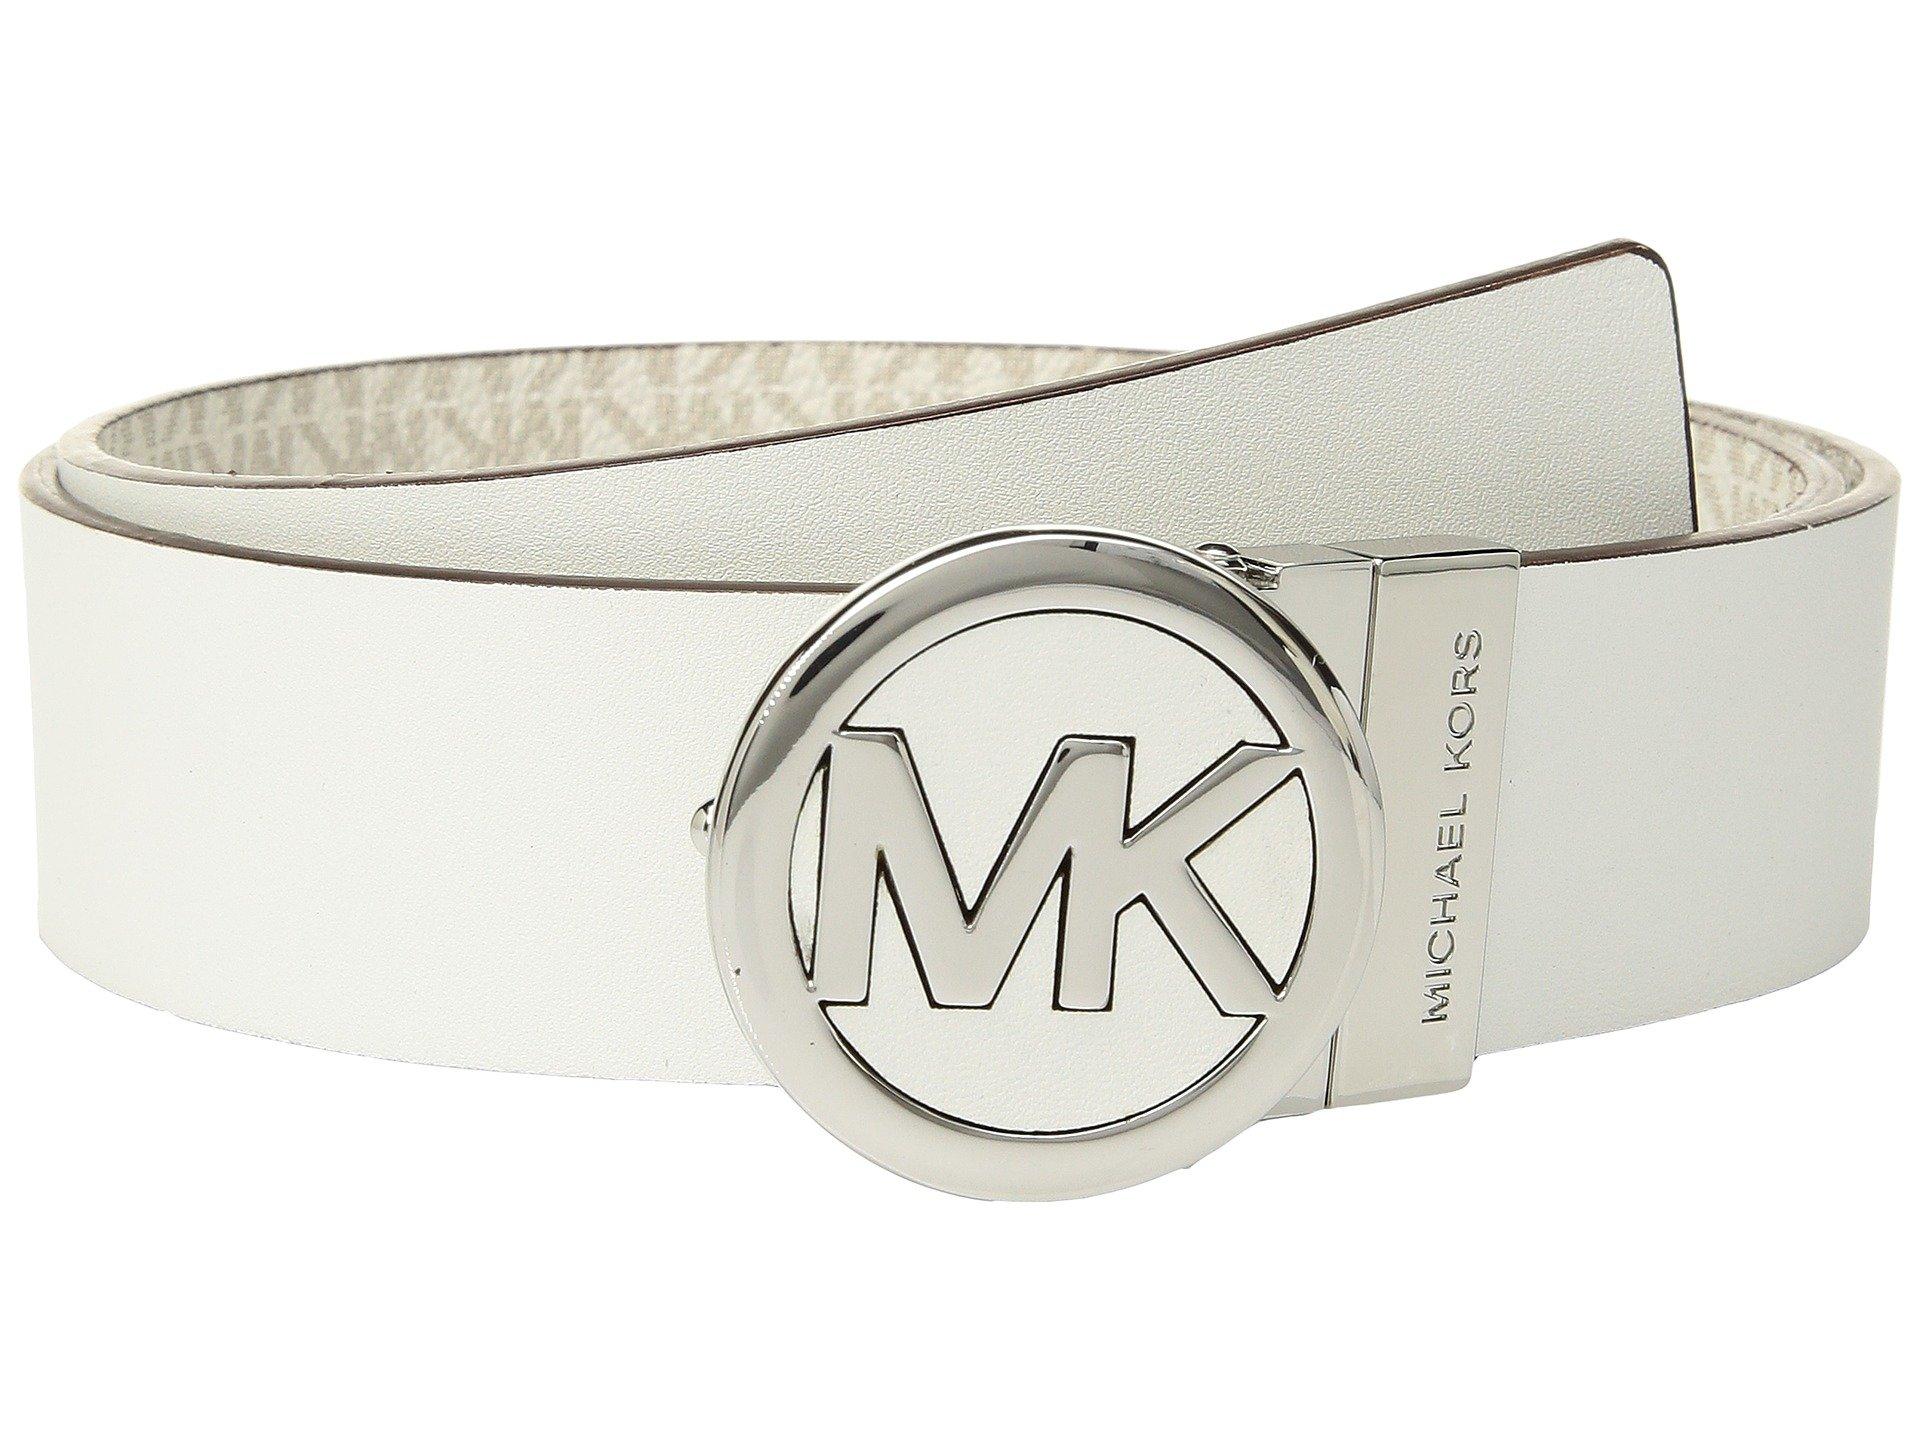 Correa o Cinturon para Mujer MICHAEL Michael Kors Smooth Leather Reversible Belt  + Michael Kors en VeoyCompro.net